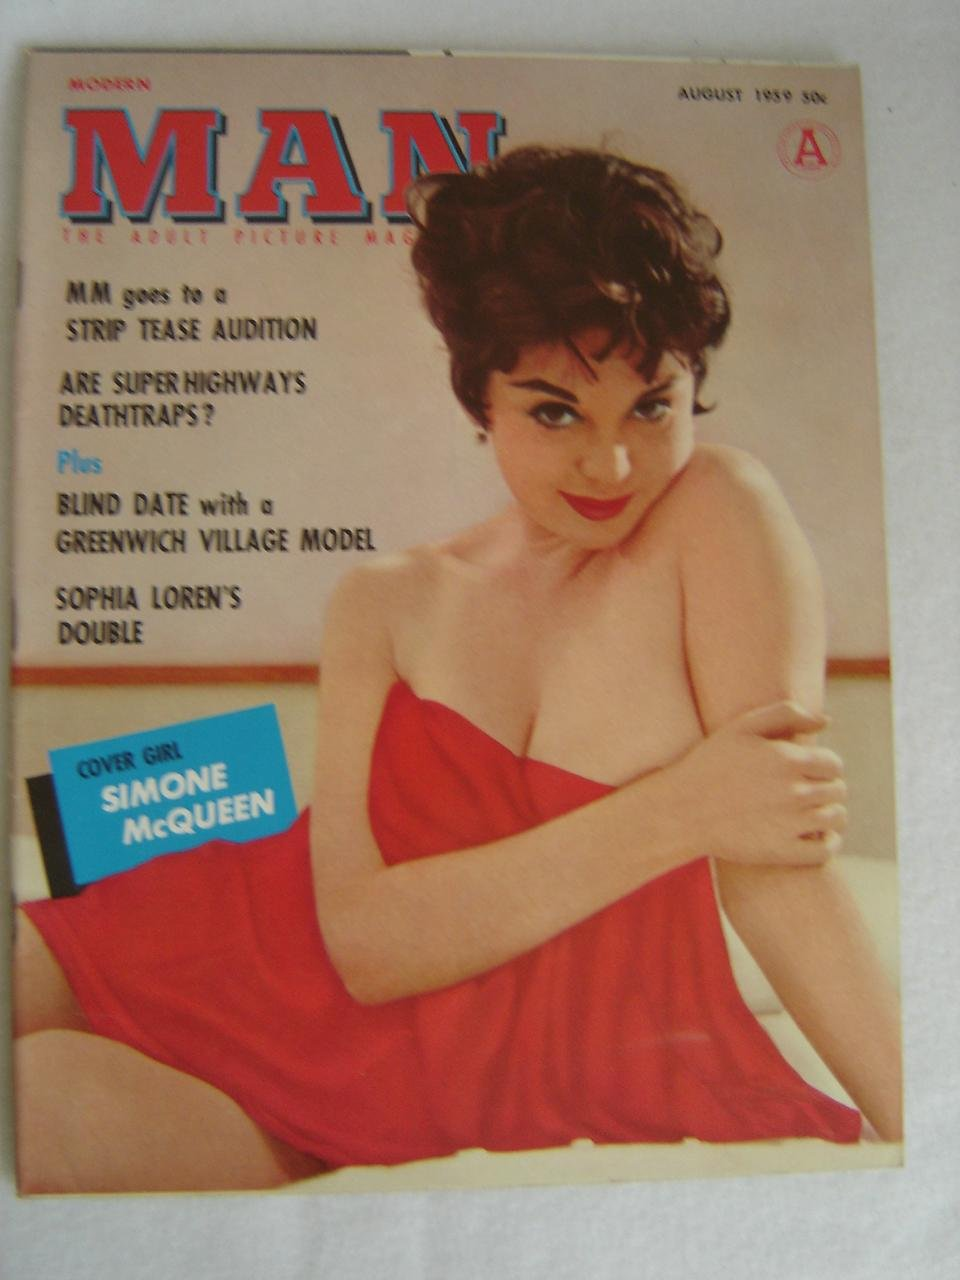 af0c865185b9 Modern Man ; The Adult Picture Magazine ; August 1959 ; Volume VIII No.14-98  Paperback – 1959